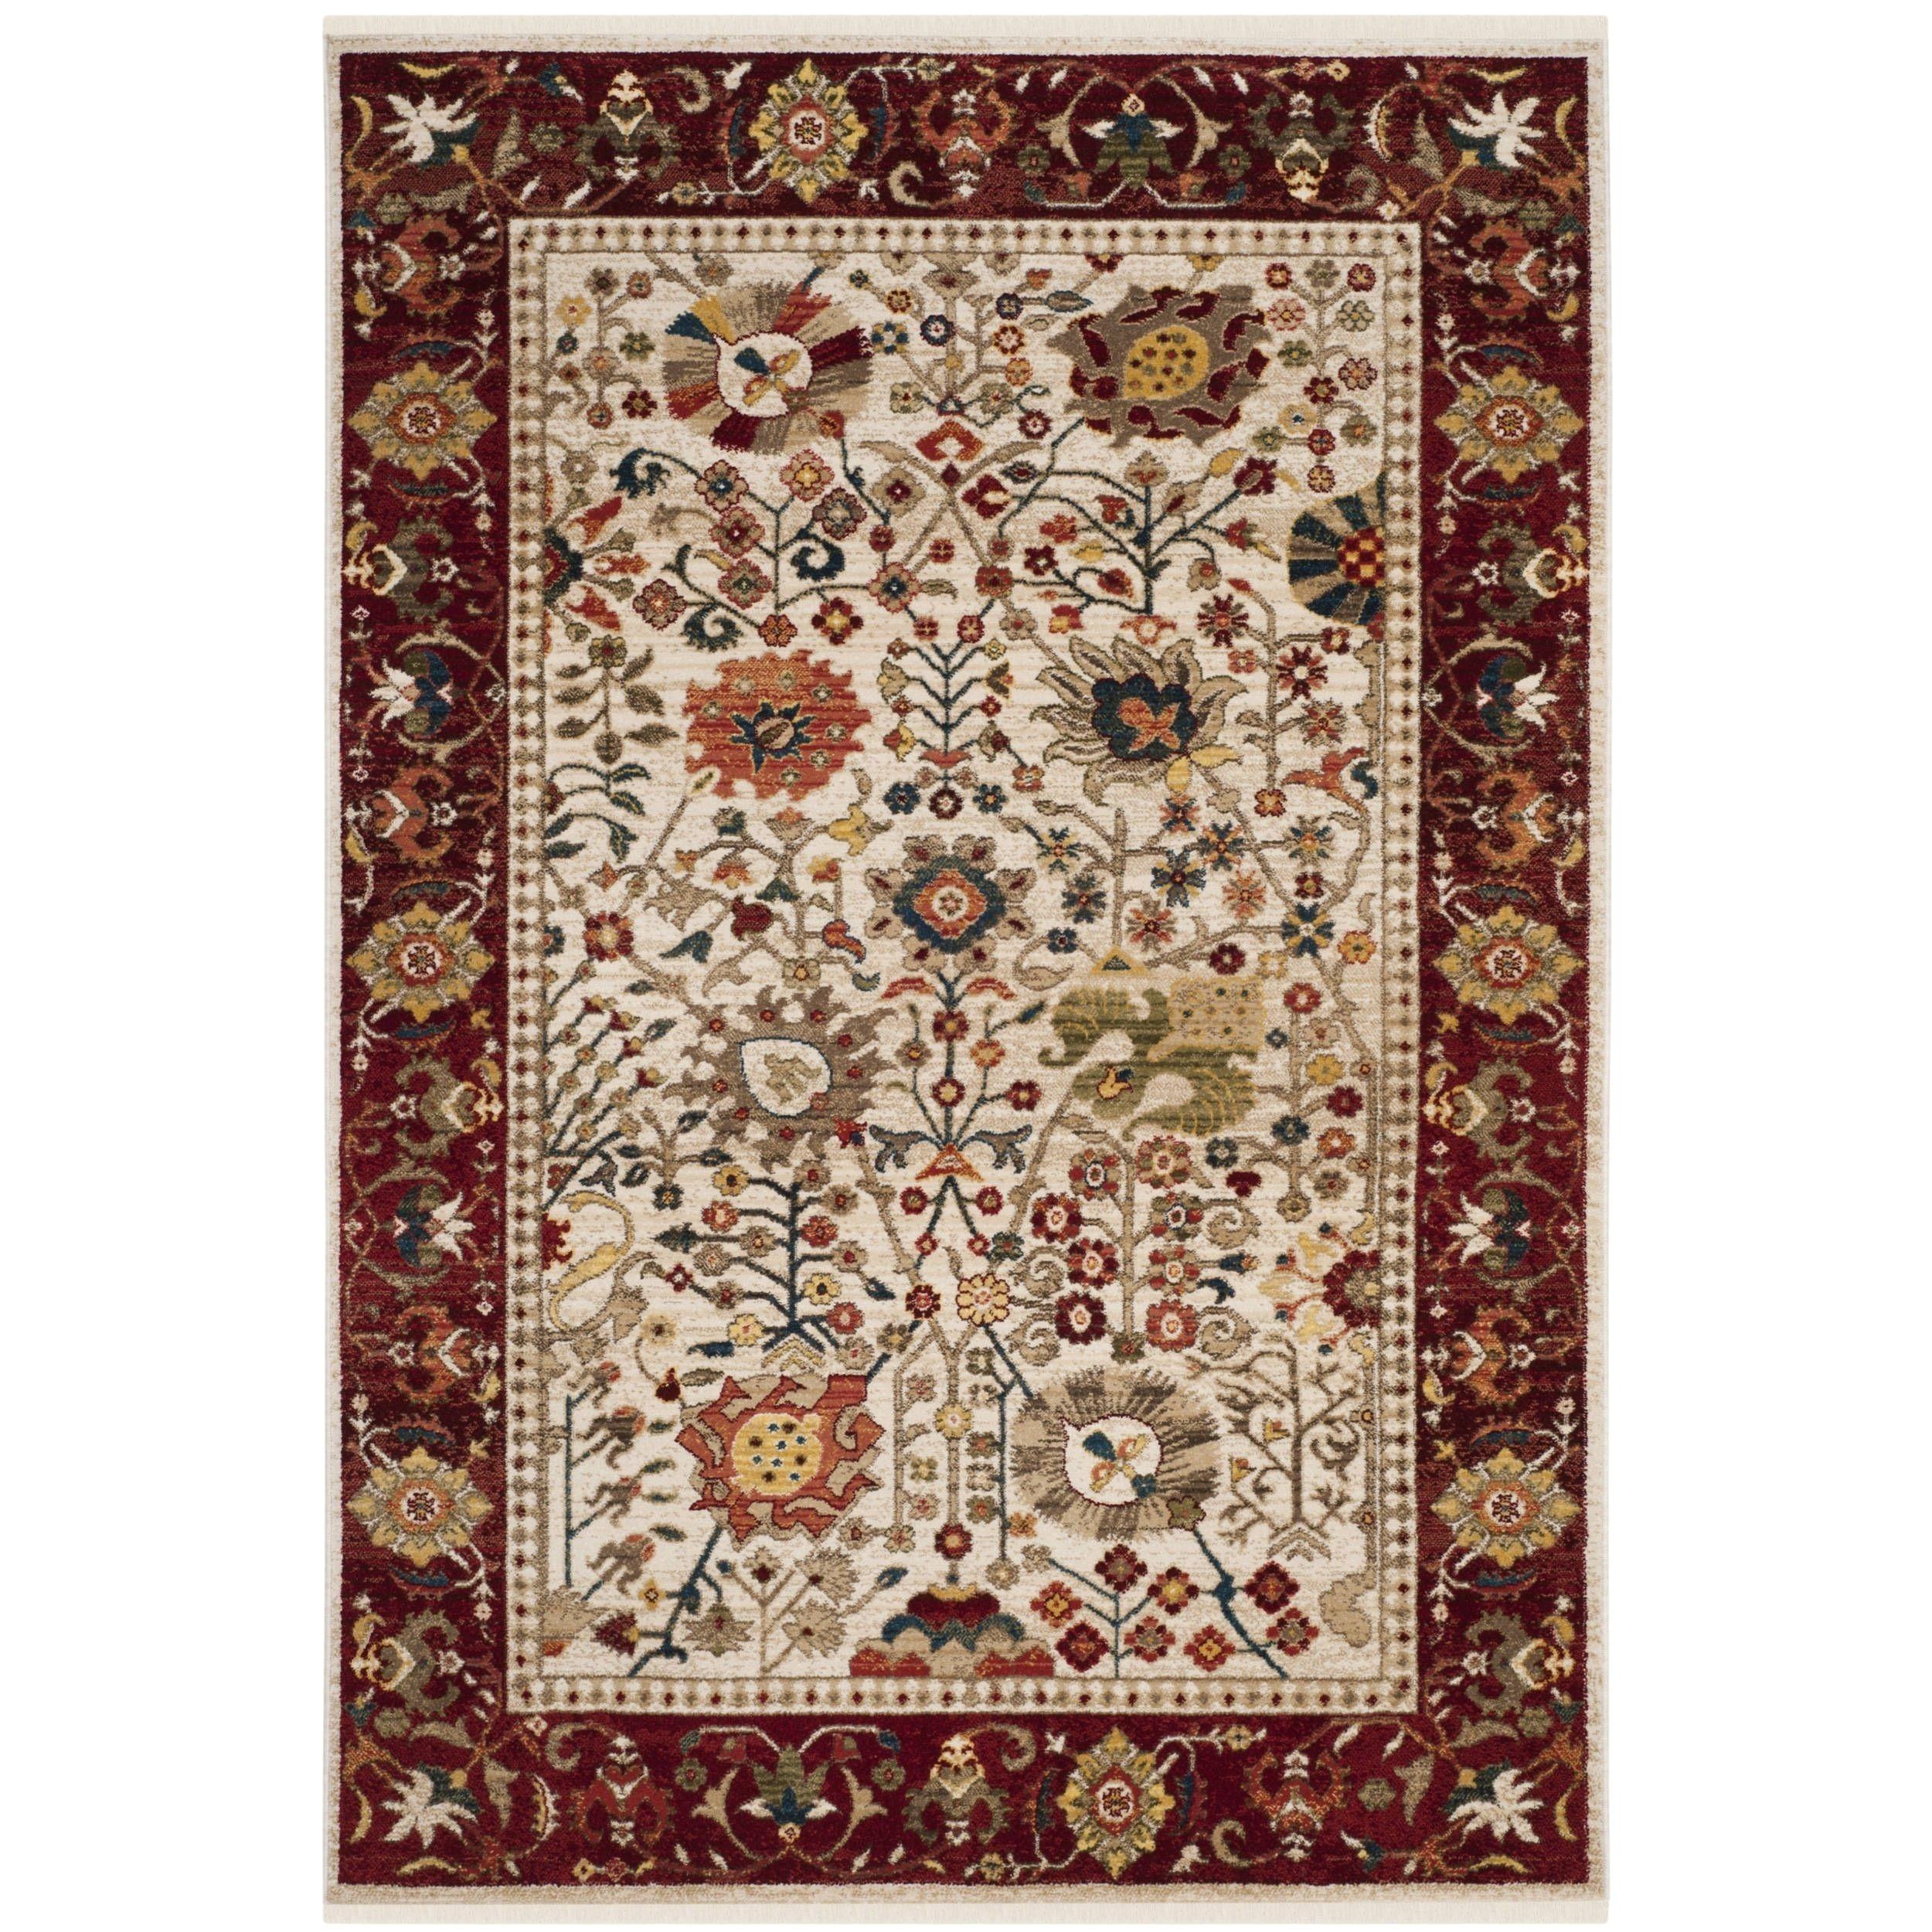 safavieh kashan ivory red rug 9 x 12 ksn303d 9 size 9 x 12 polypropylene oriental